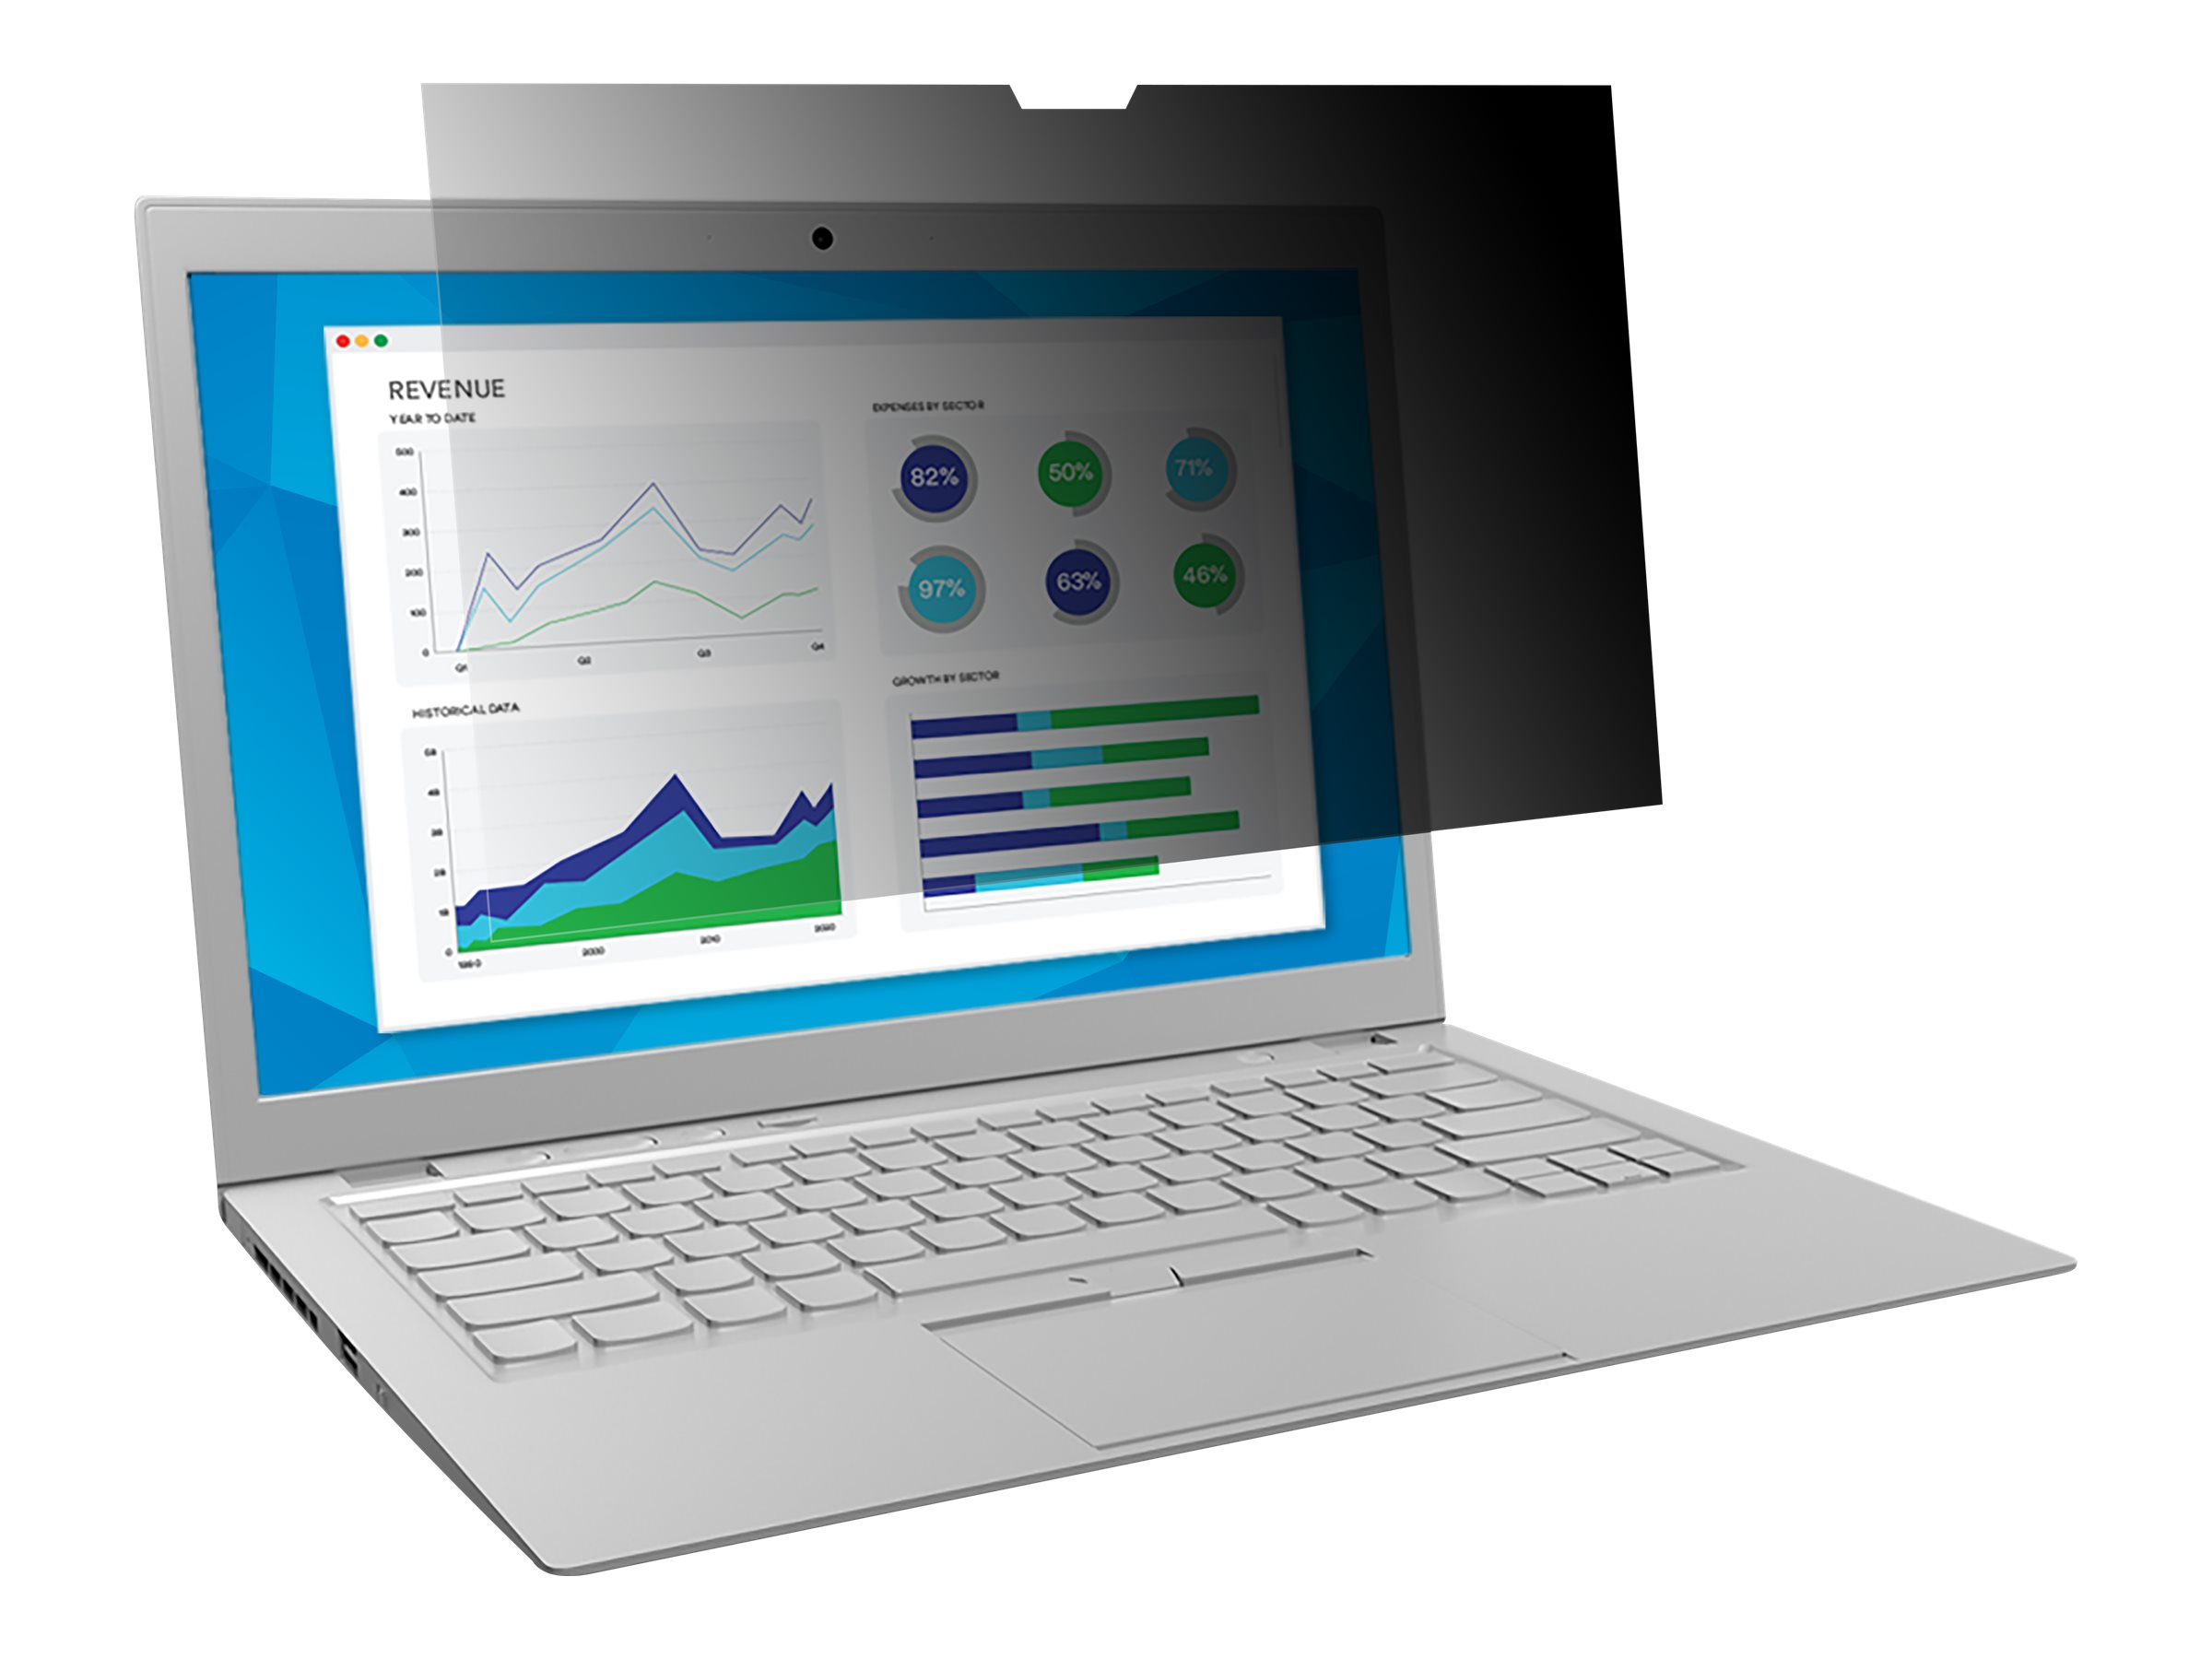 "3M Blickschutzfilter for 14.0"" Widescreen Laptop with COMPLY Attachment System - Blickschutzfilter für Notebook - 35,6 cm Breitbild (14"" Breitbild)"